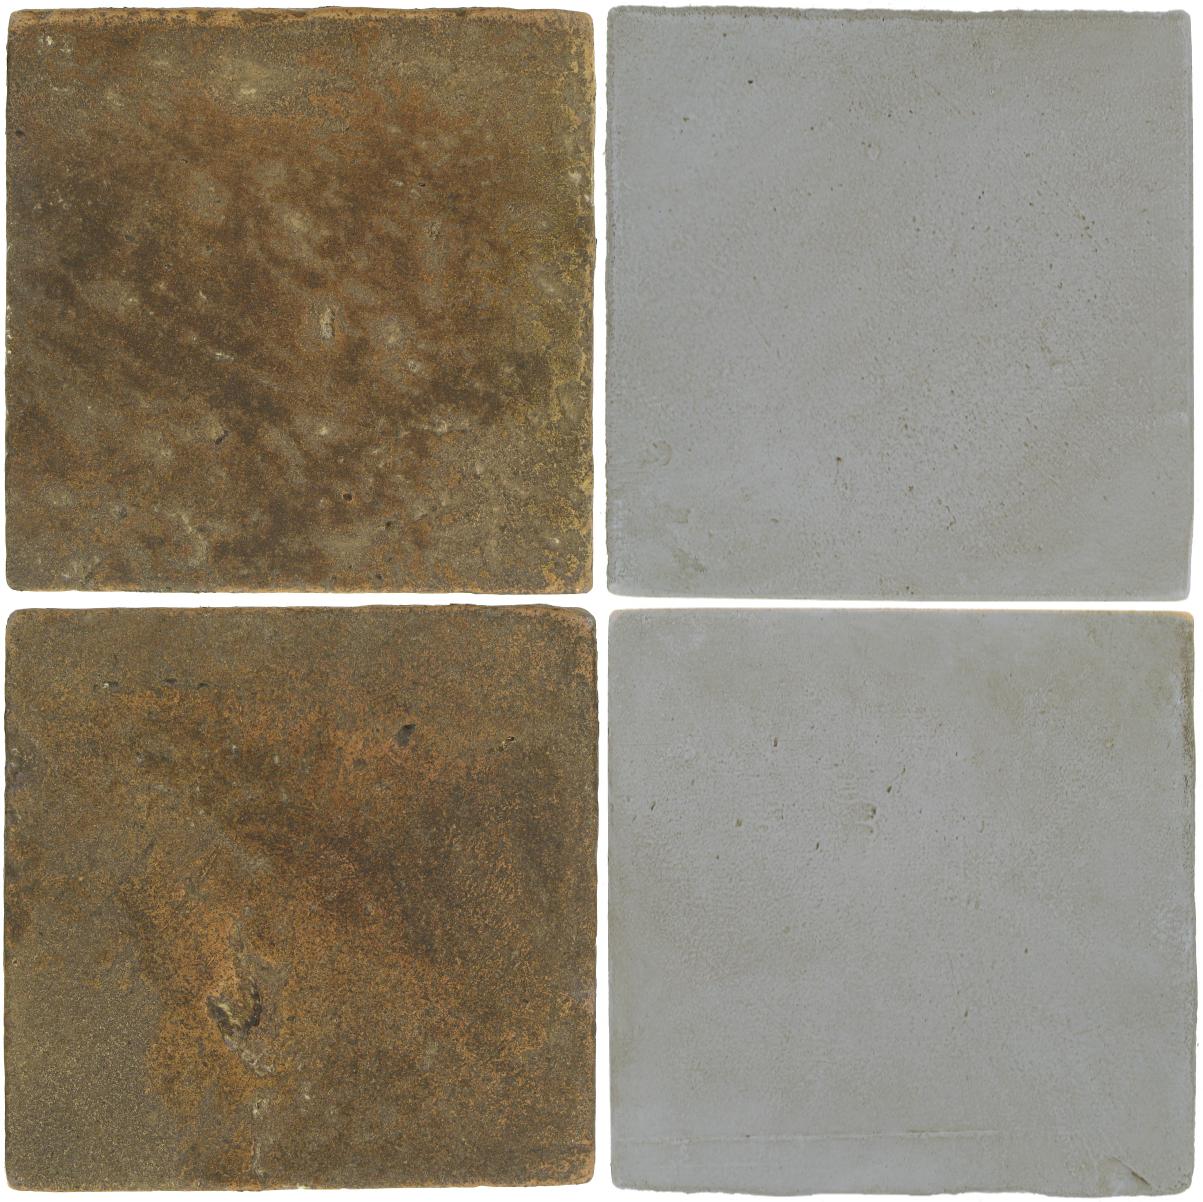 Pedralbes Antique Terracotta  2 Color Combinations  VTG-PSVN Verona Brown + OHS-PGOG Oyster Grey